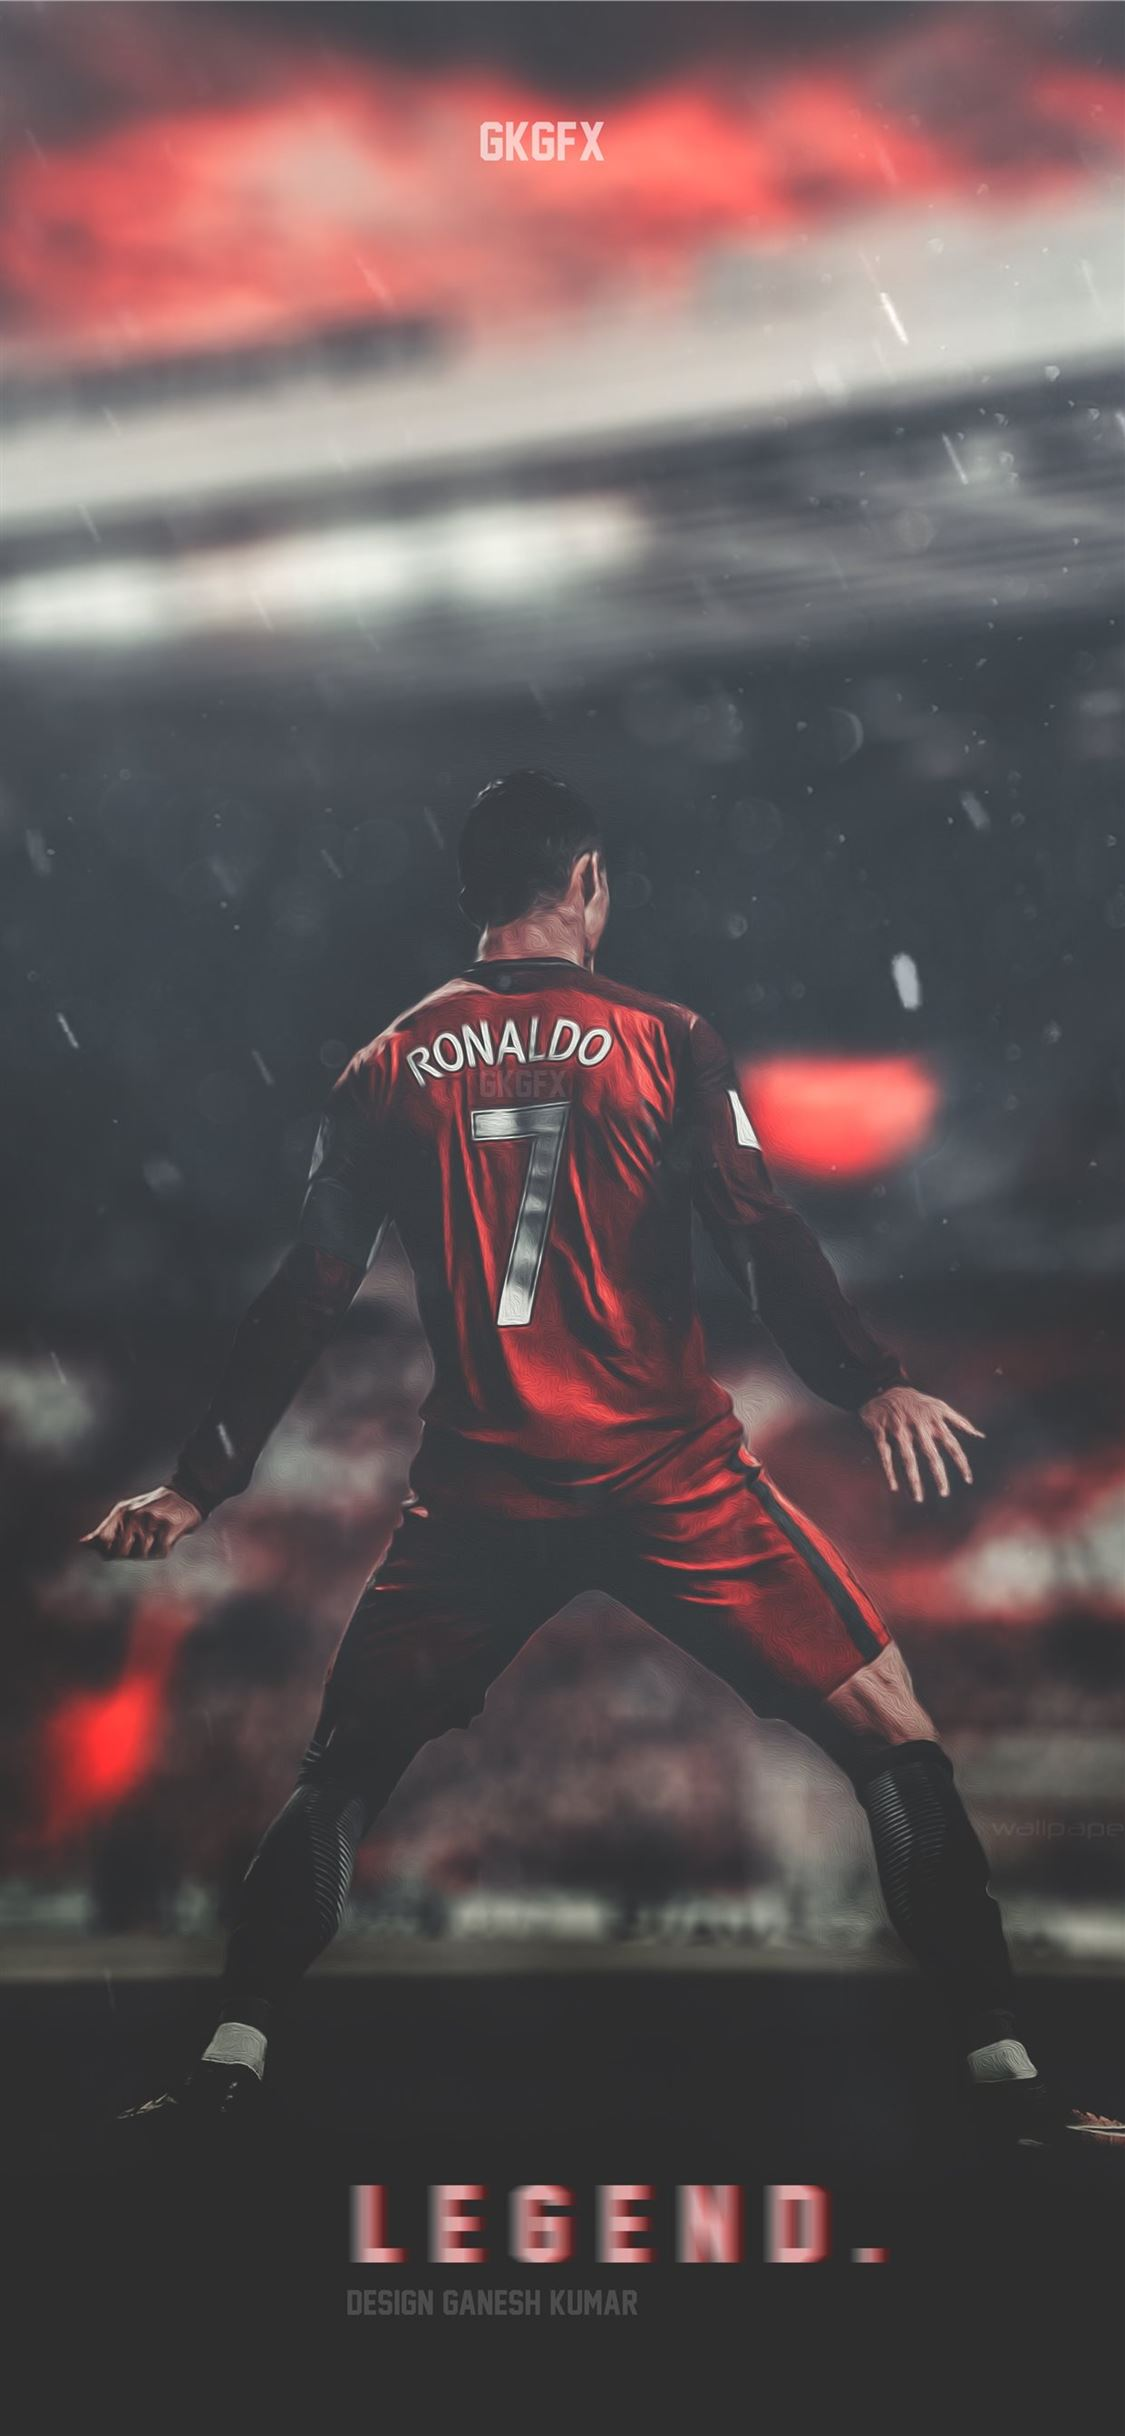 Best Soccer Celebrity Iphone X Wallpapers Hd Ilikewallpaper